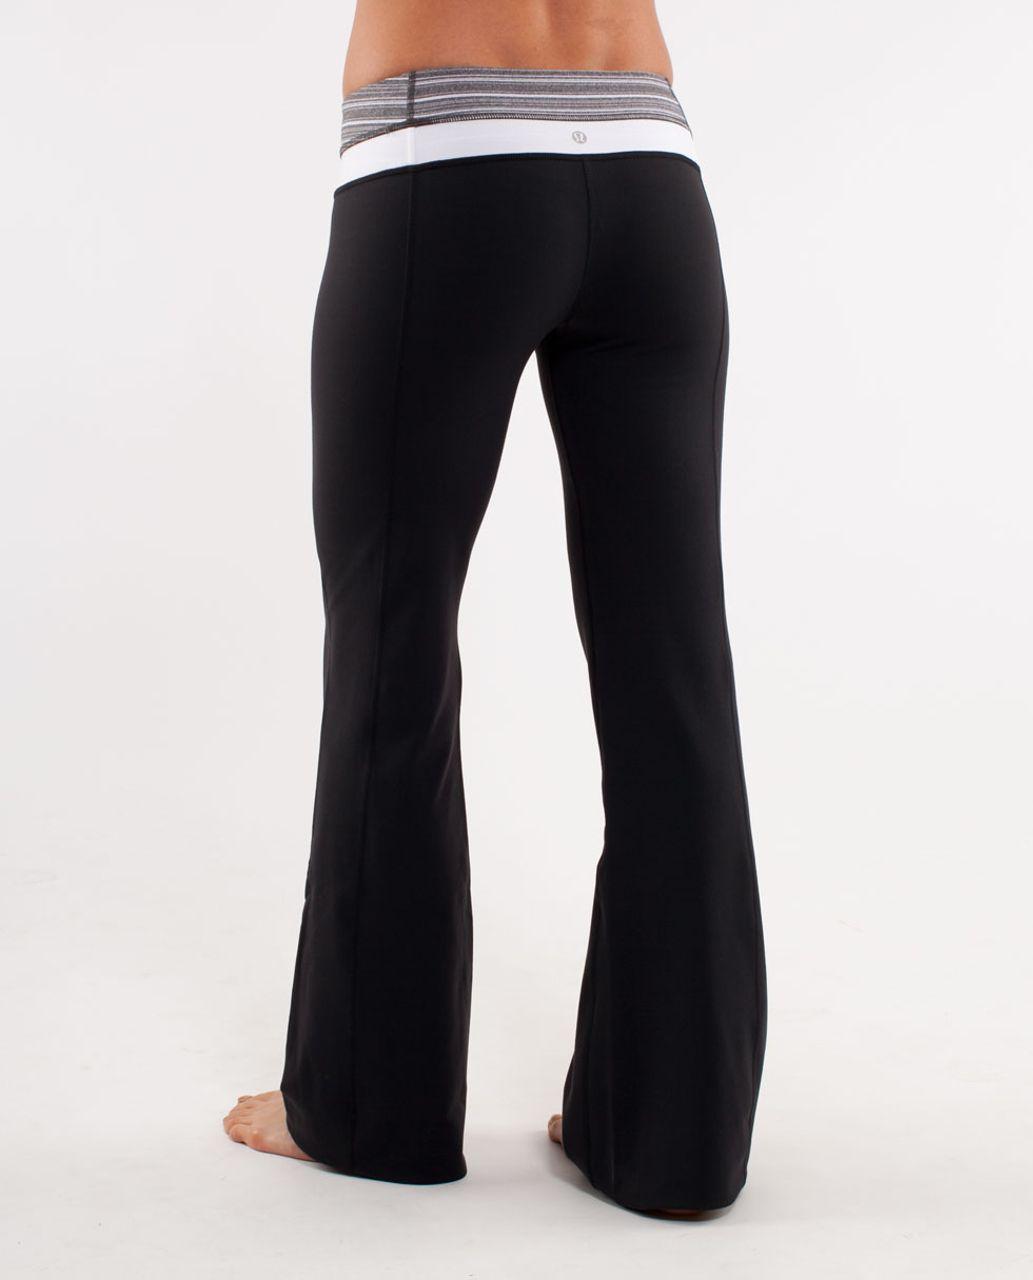 Lululemon Groove Pant (Tall) - Black /  Coal Strata Stripe /  White